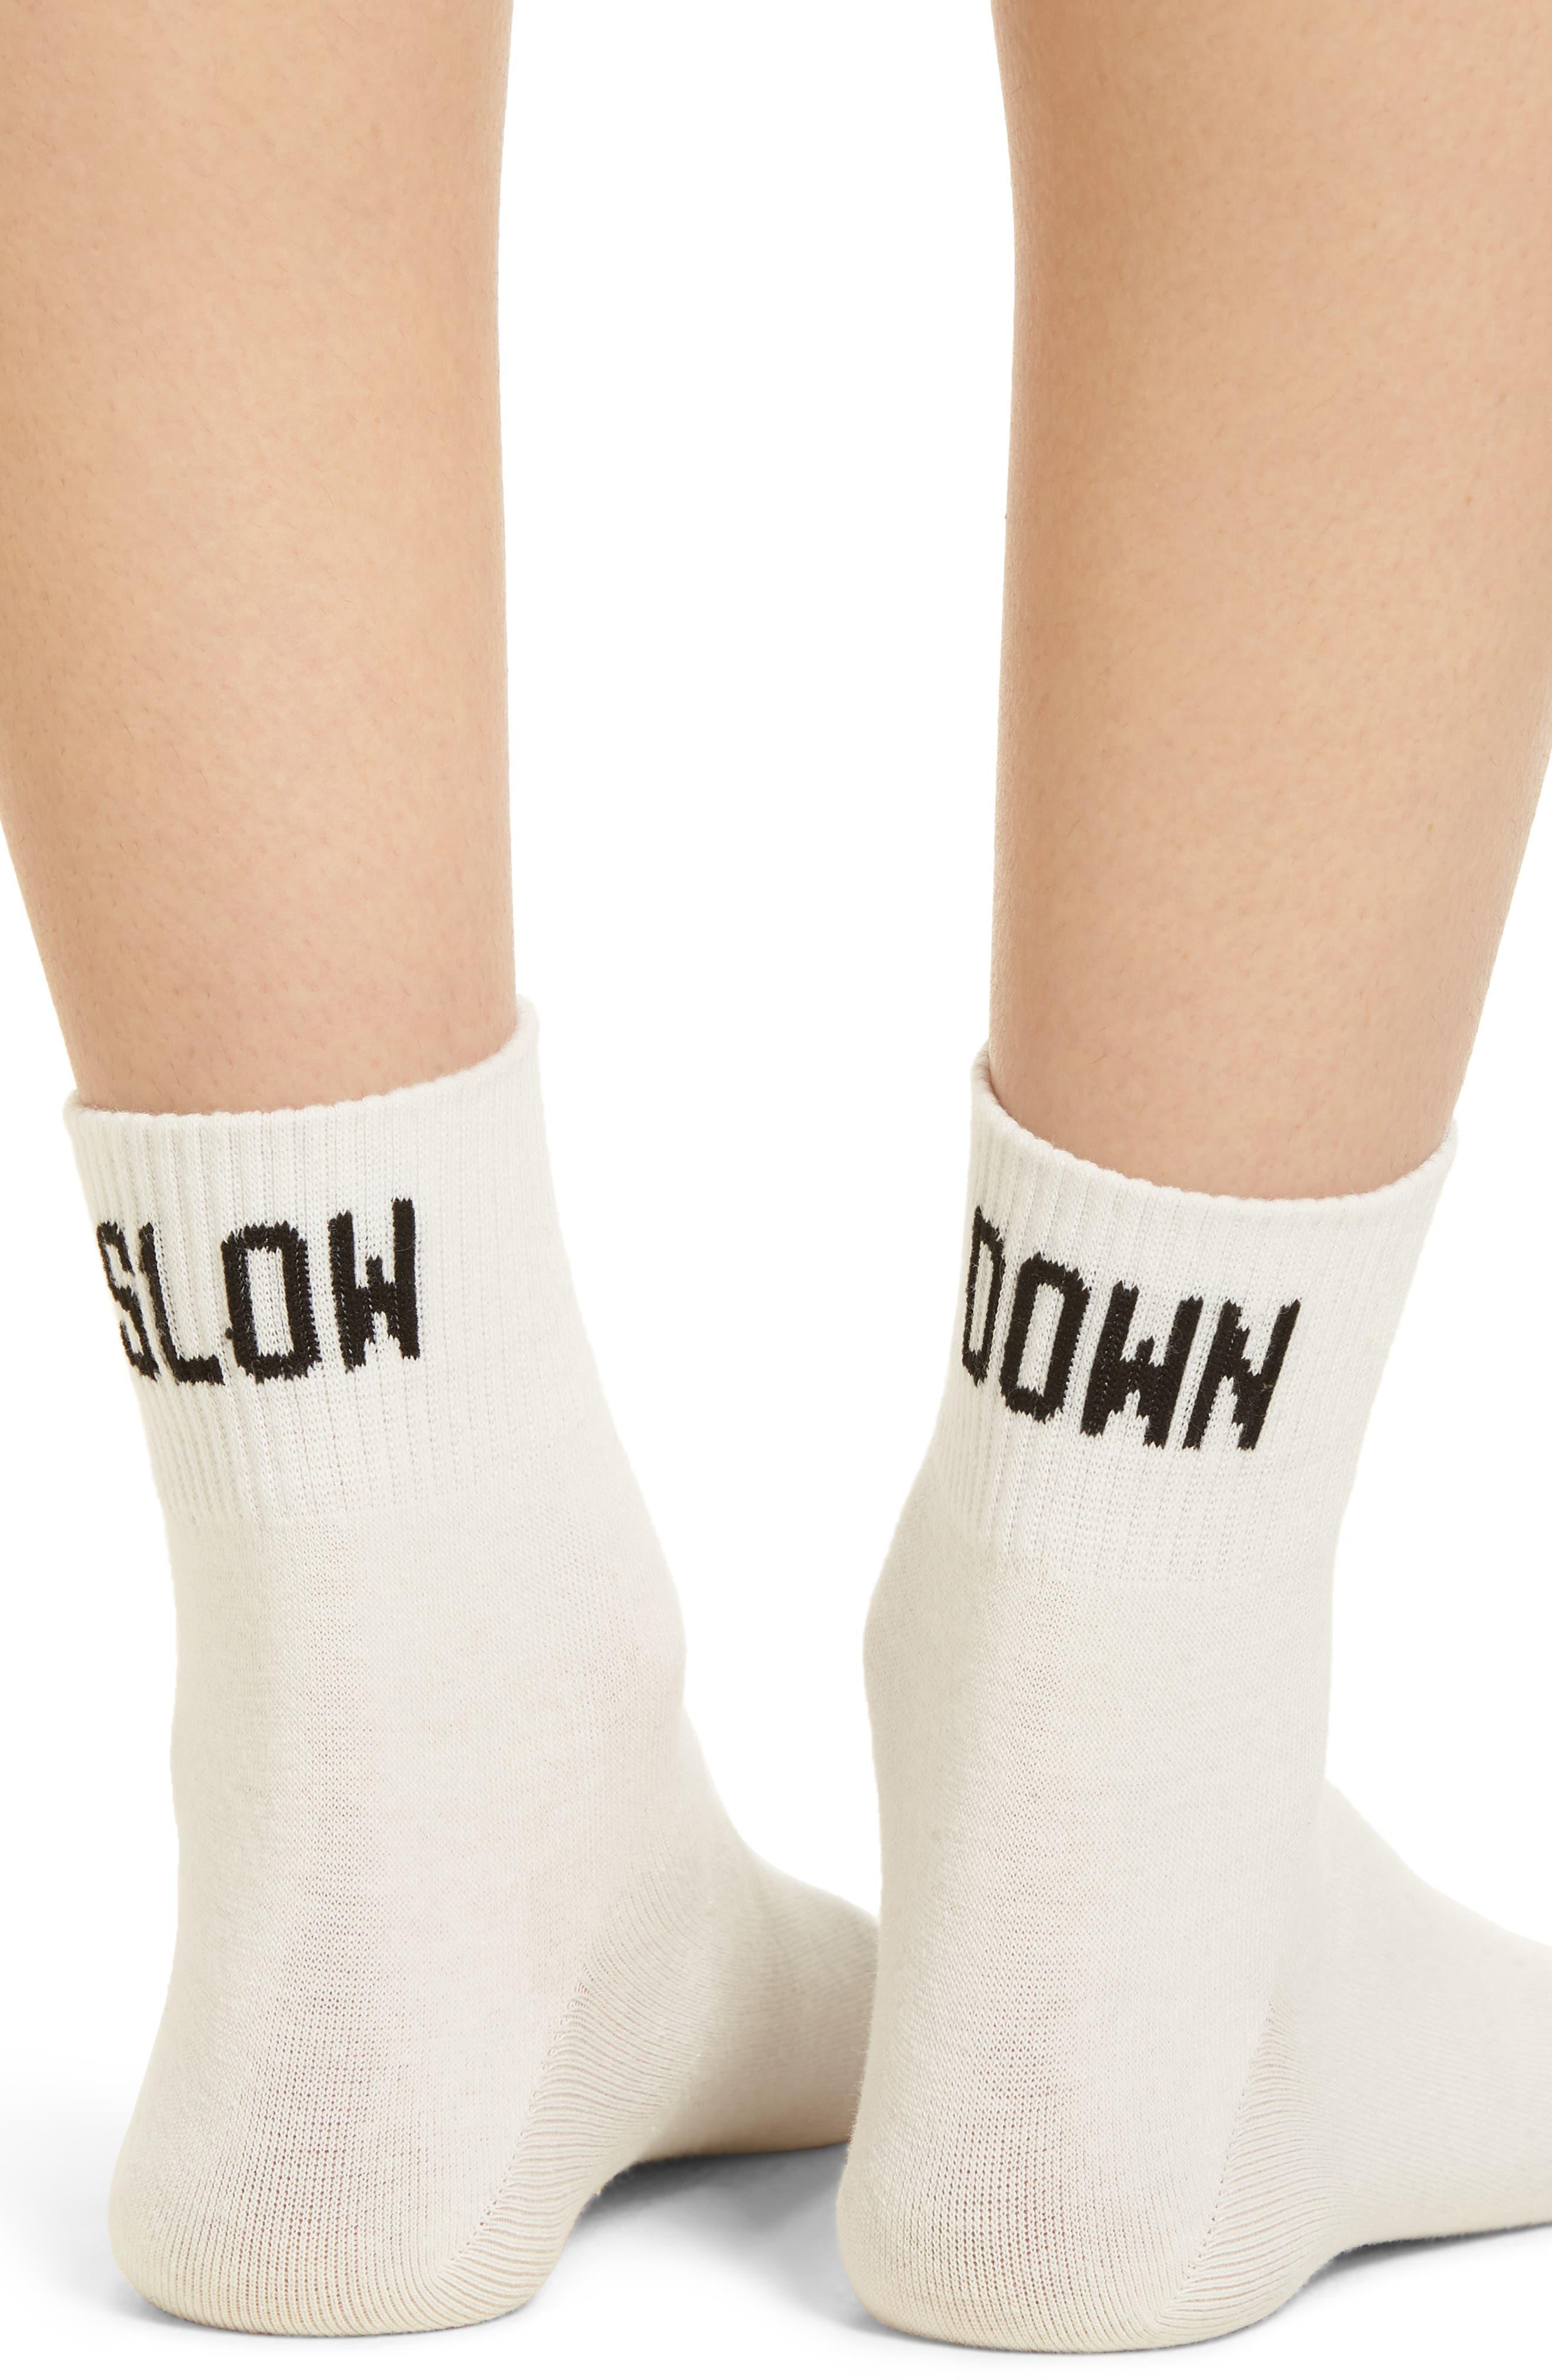 Slow Down Ankle Socks,                             Alternate thumbnail 3, color,                             100